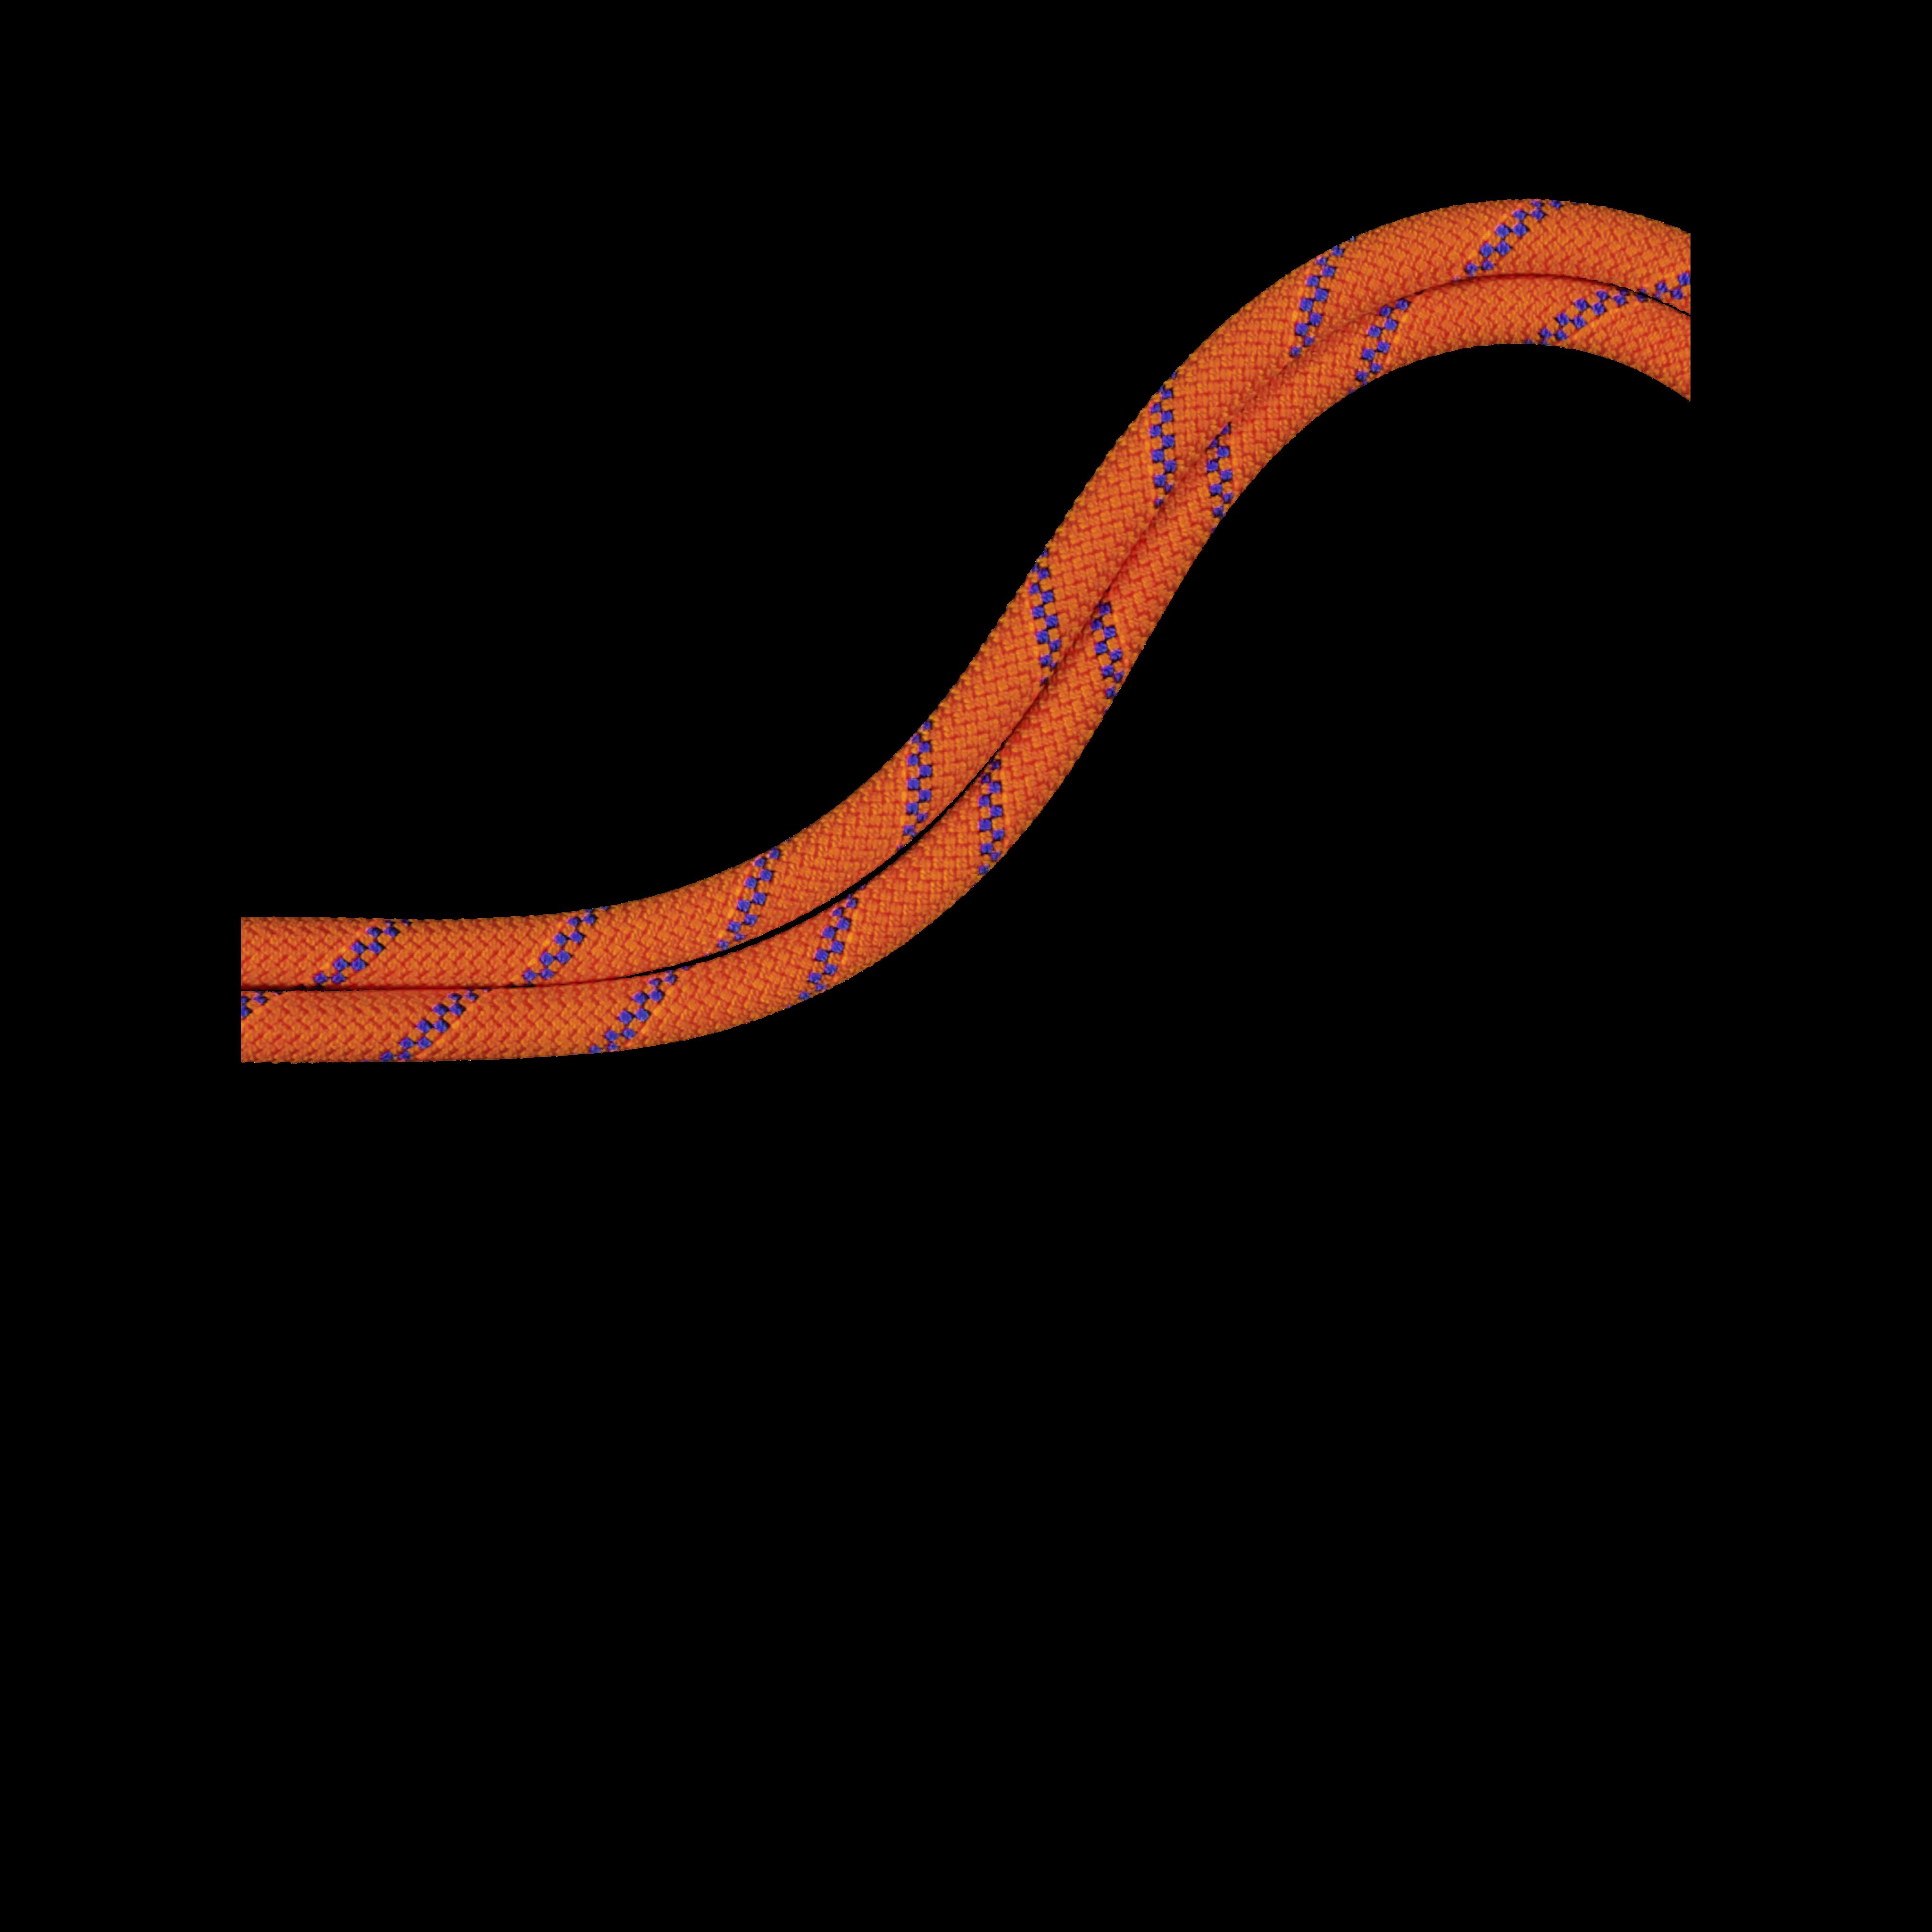 9.0 Alpine Sender Dry Rope thumbnail